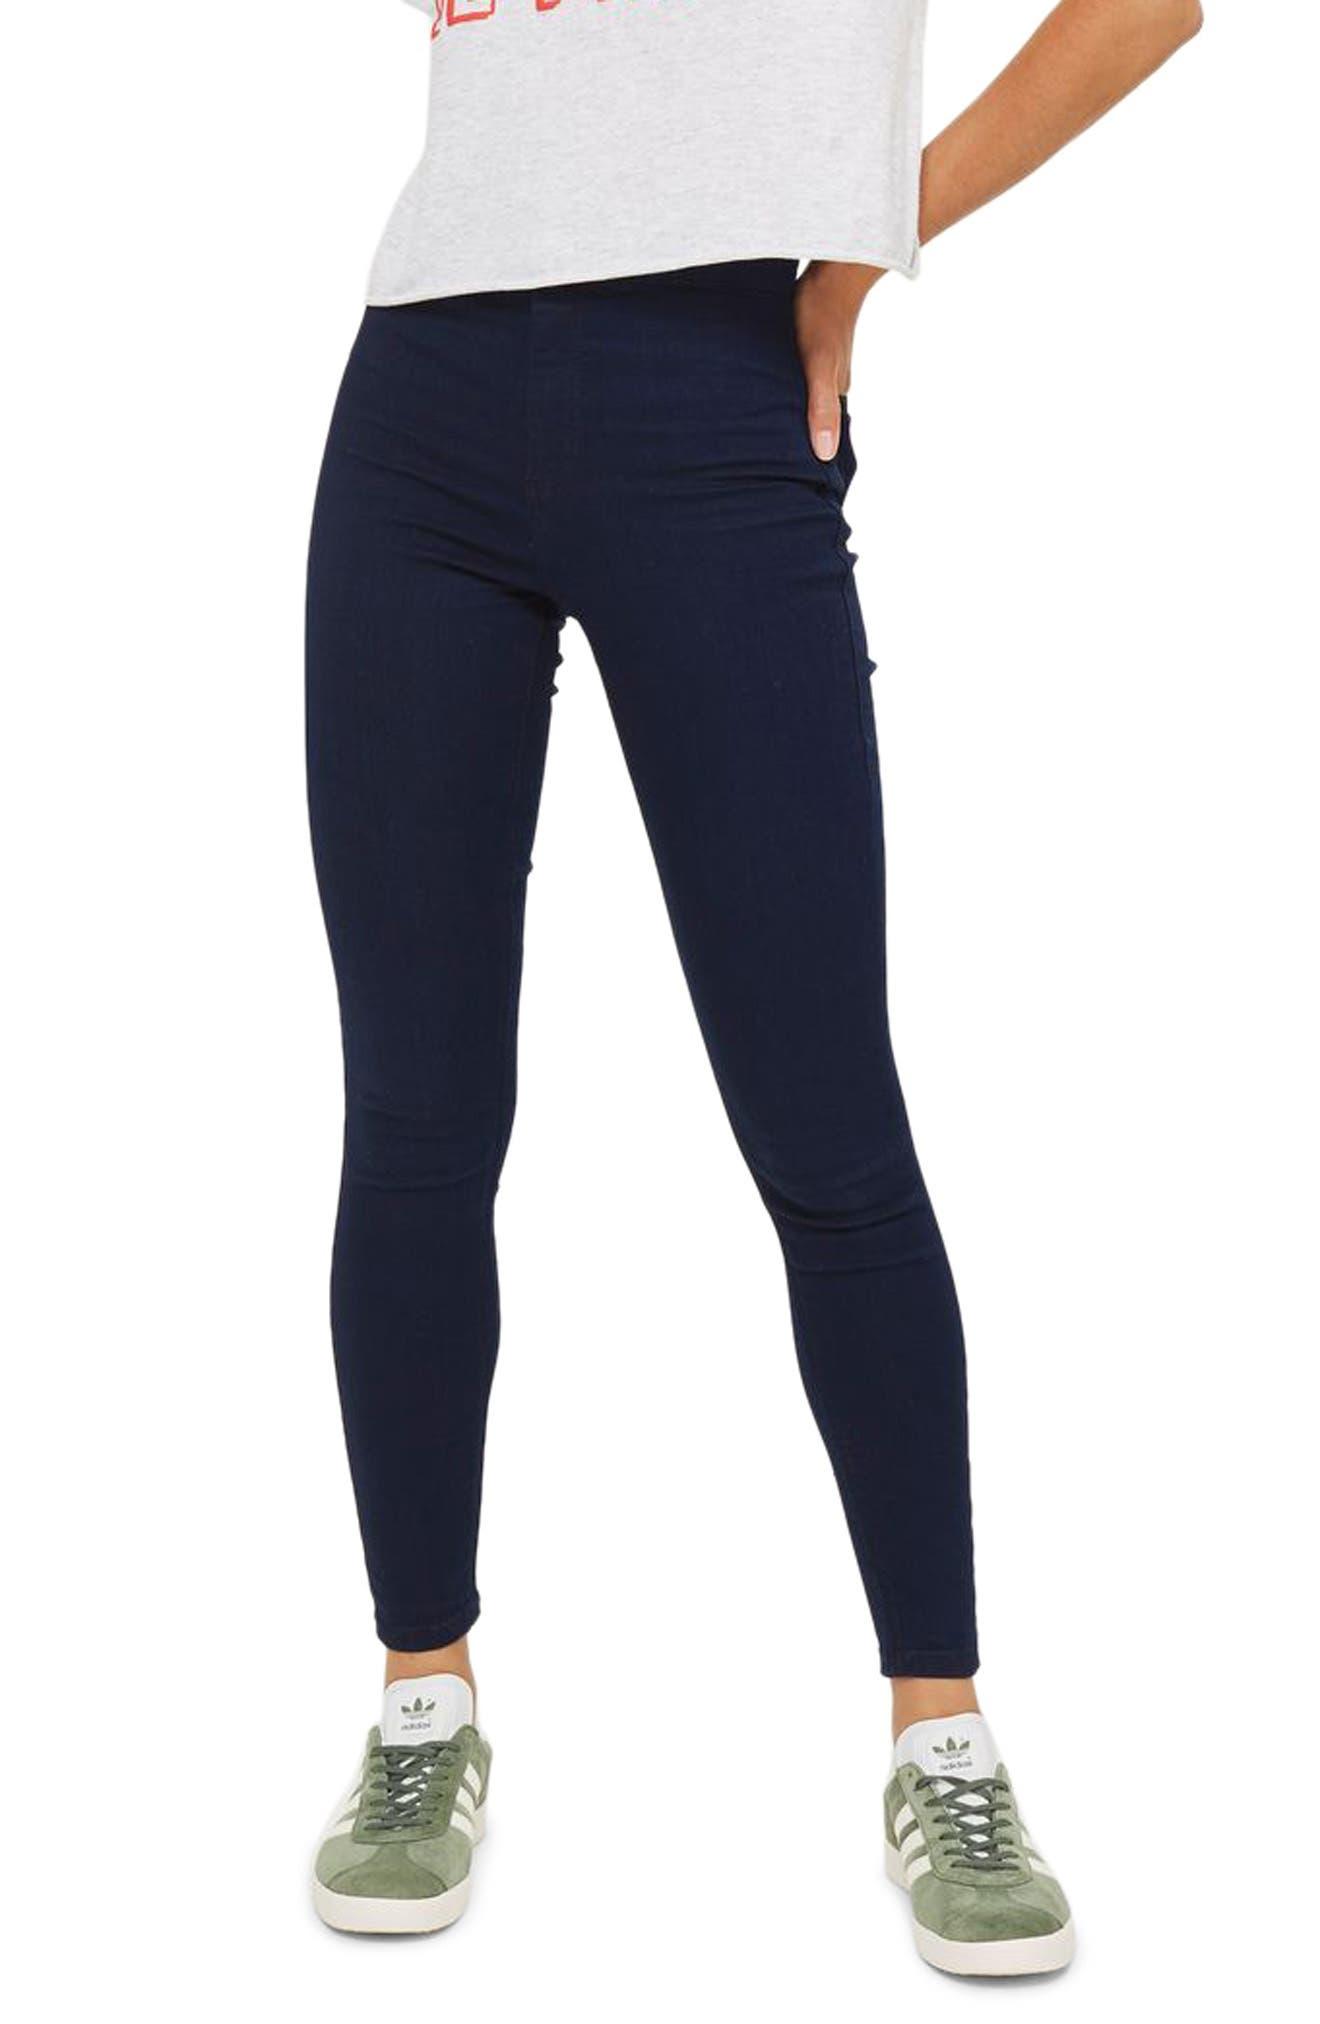 TOPSHOP Joni High Waist Skinny Jeans, Main, color, DARK INDIGO